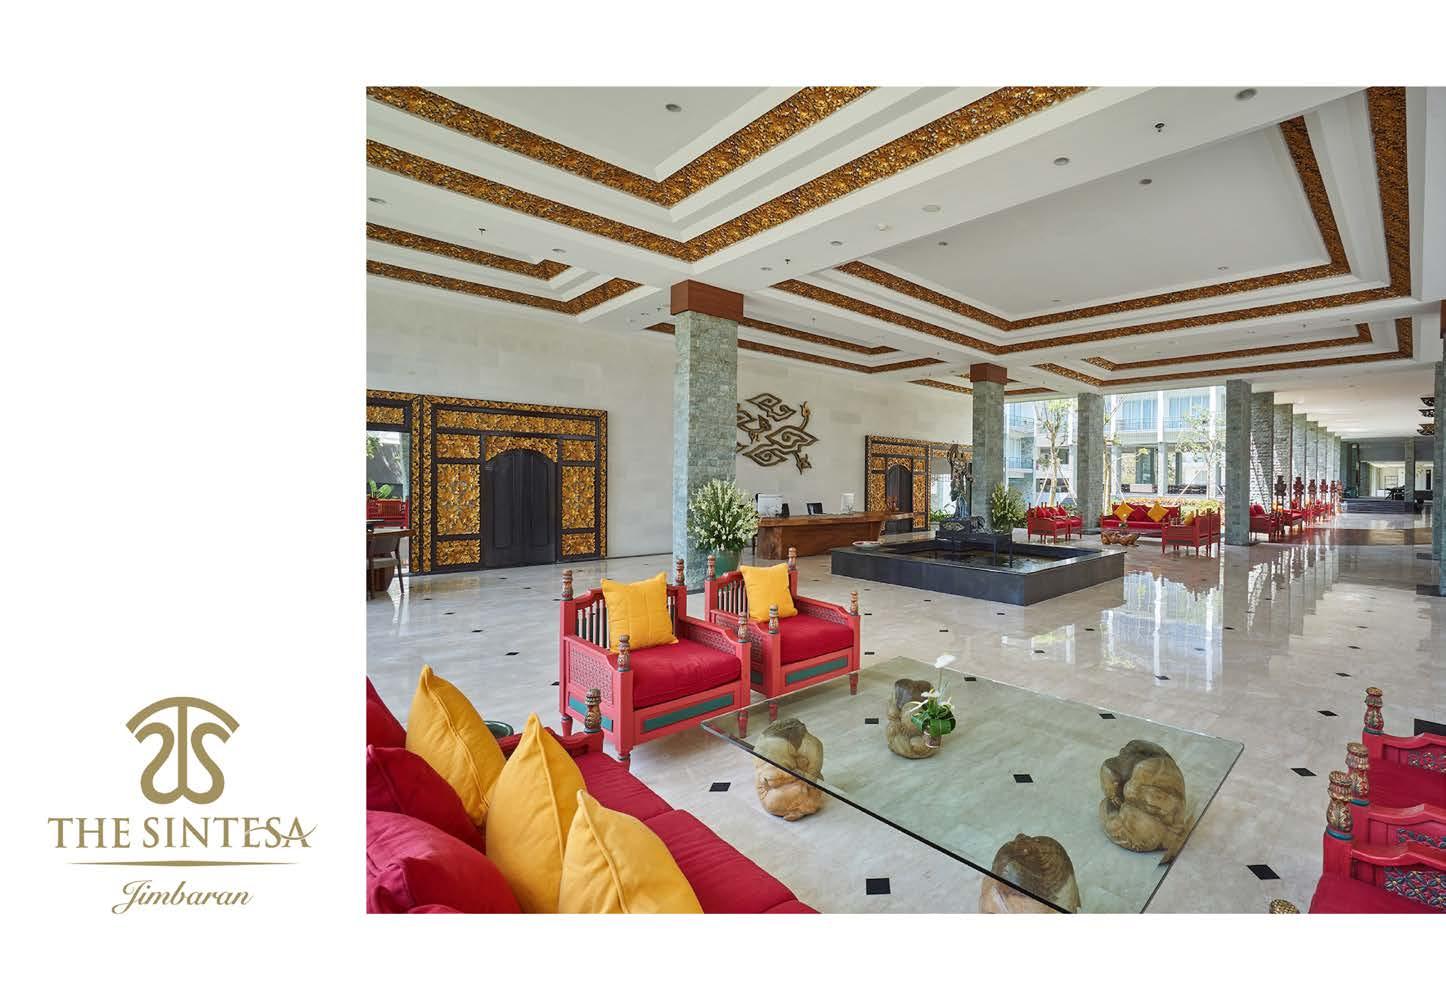 sintesa-hotel6